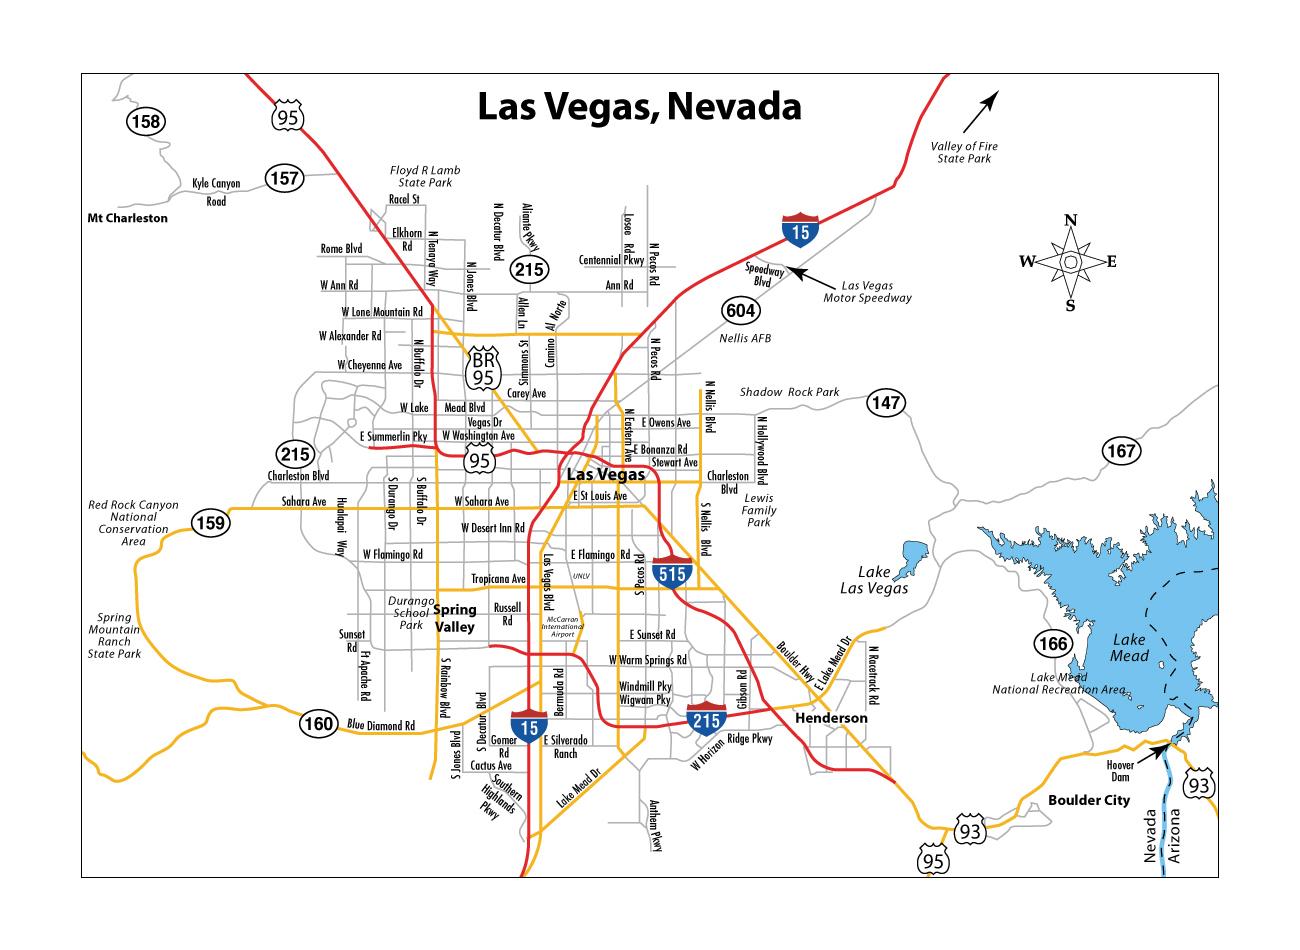 Detailed Road Map Of Las Vegas Las Vegas Nevada State USA - Las vegas nevada usa map